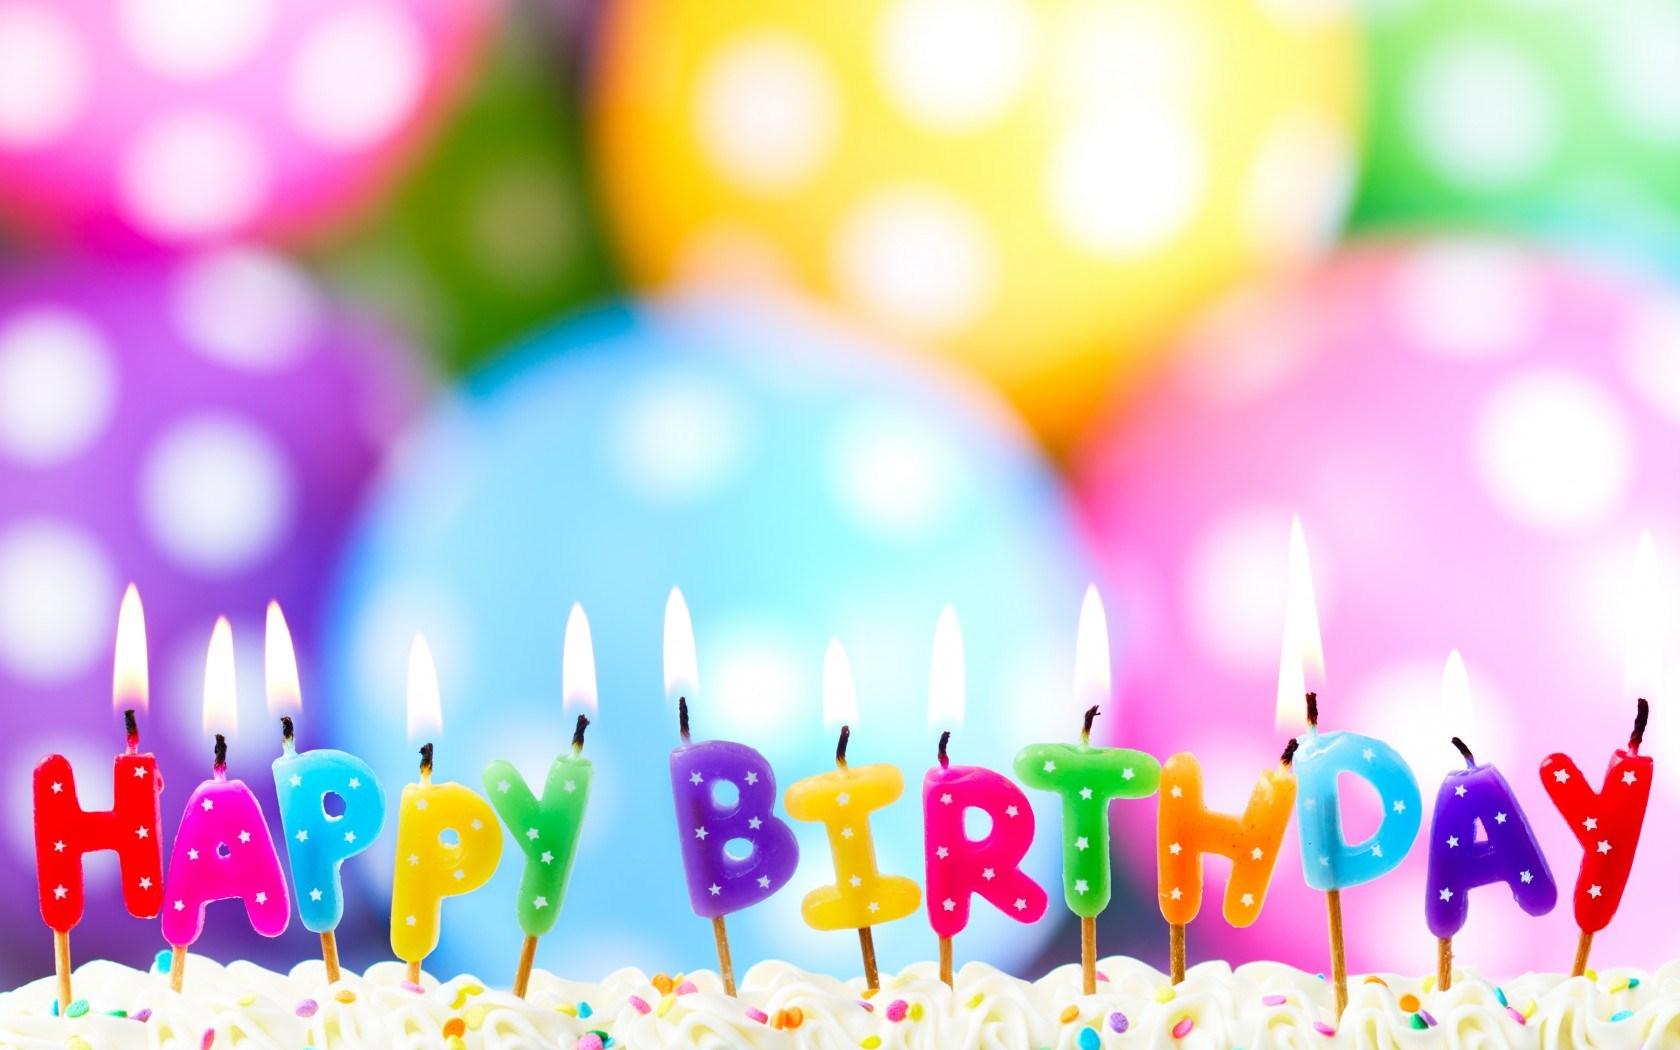 cake candles happy birthday balloons bokeh photo hd wallpaper 1680x1050